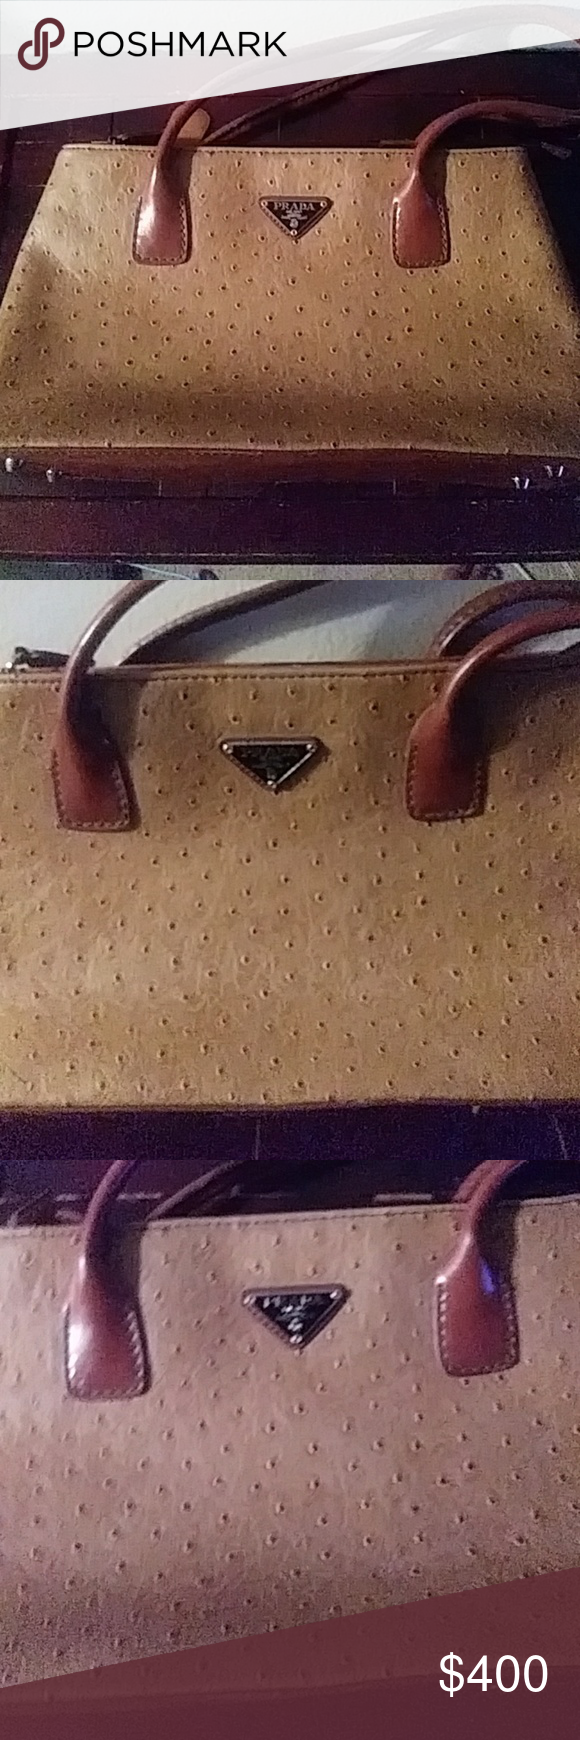 448a8336c7 ... spain selling this prada milano dal 1913 purse on poshmark my username  is kasonhot41. shopmycloset